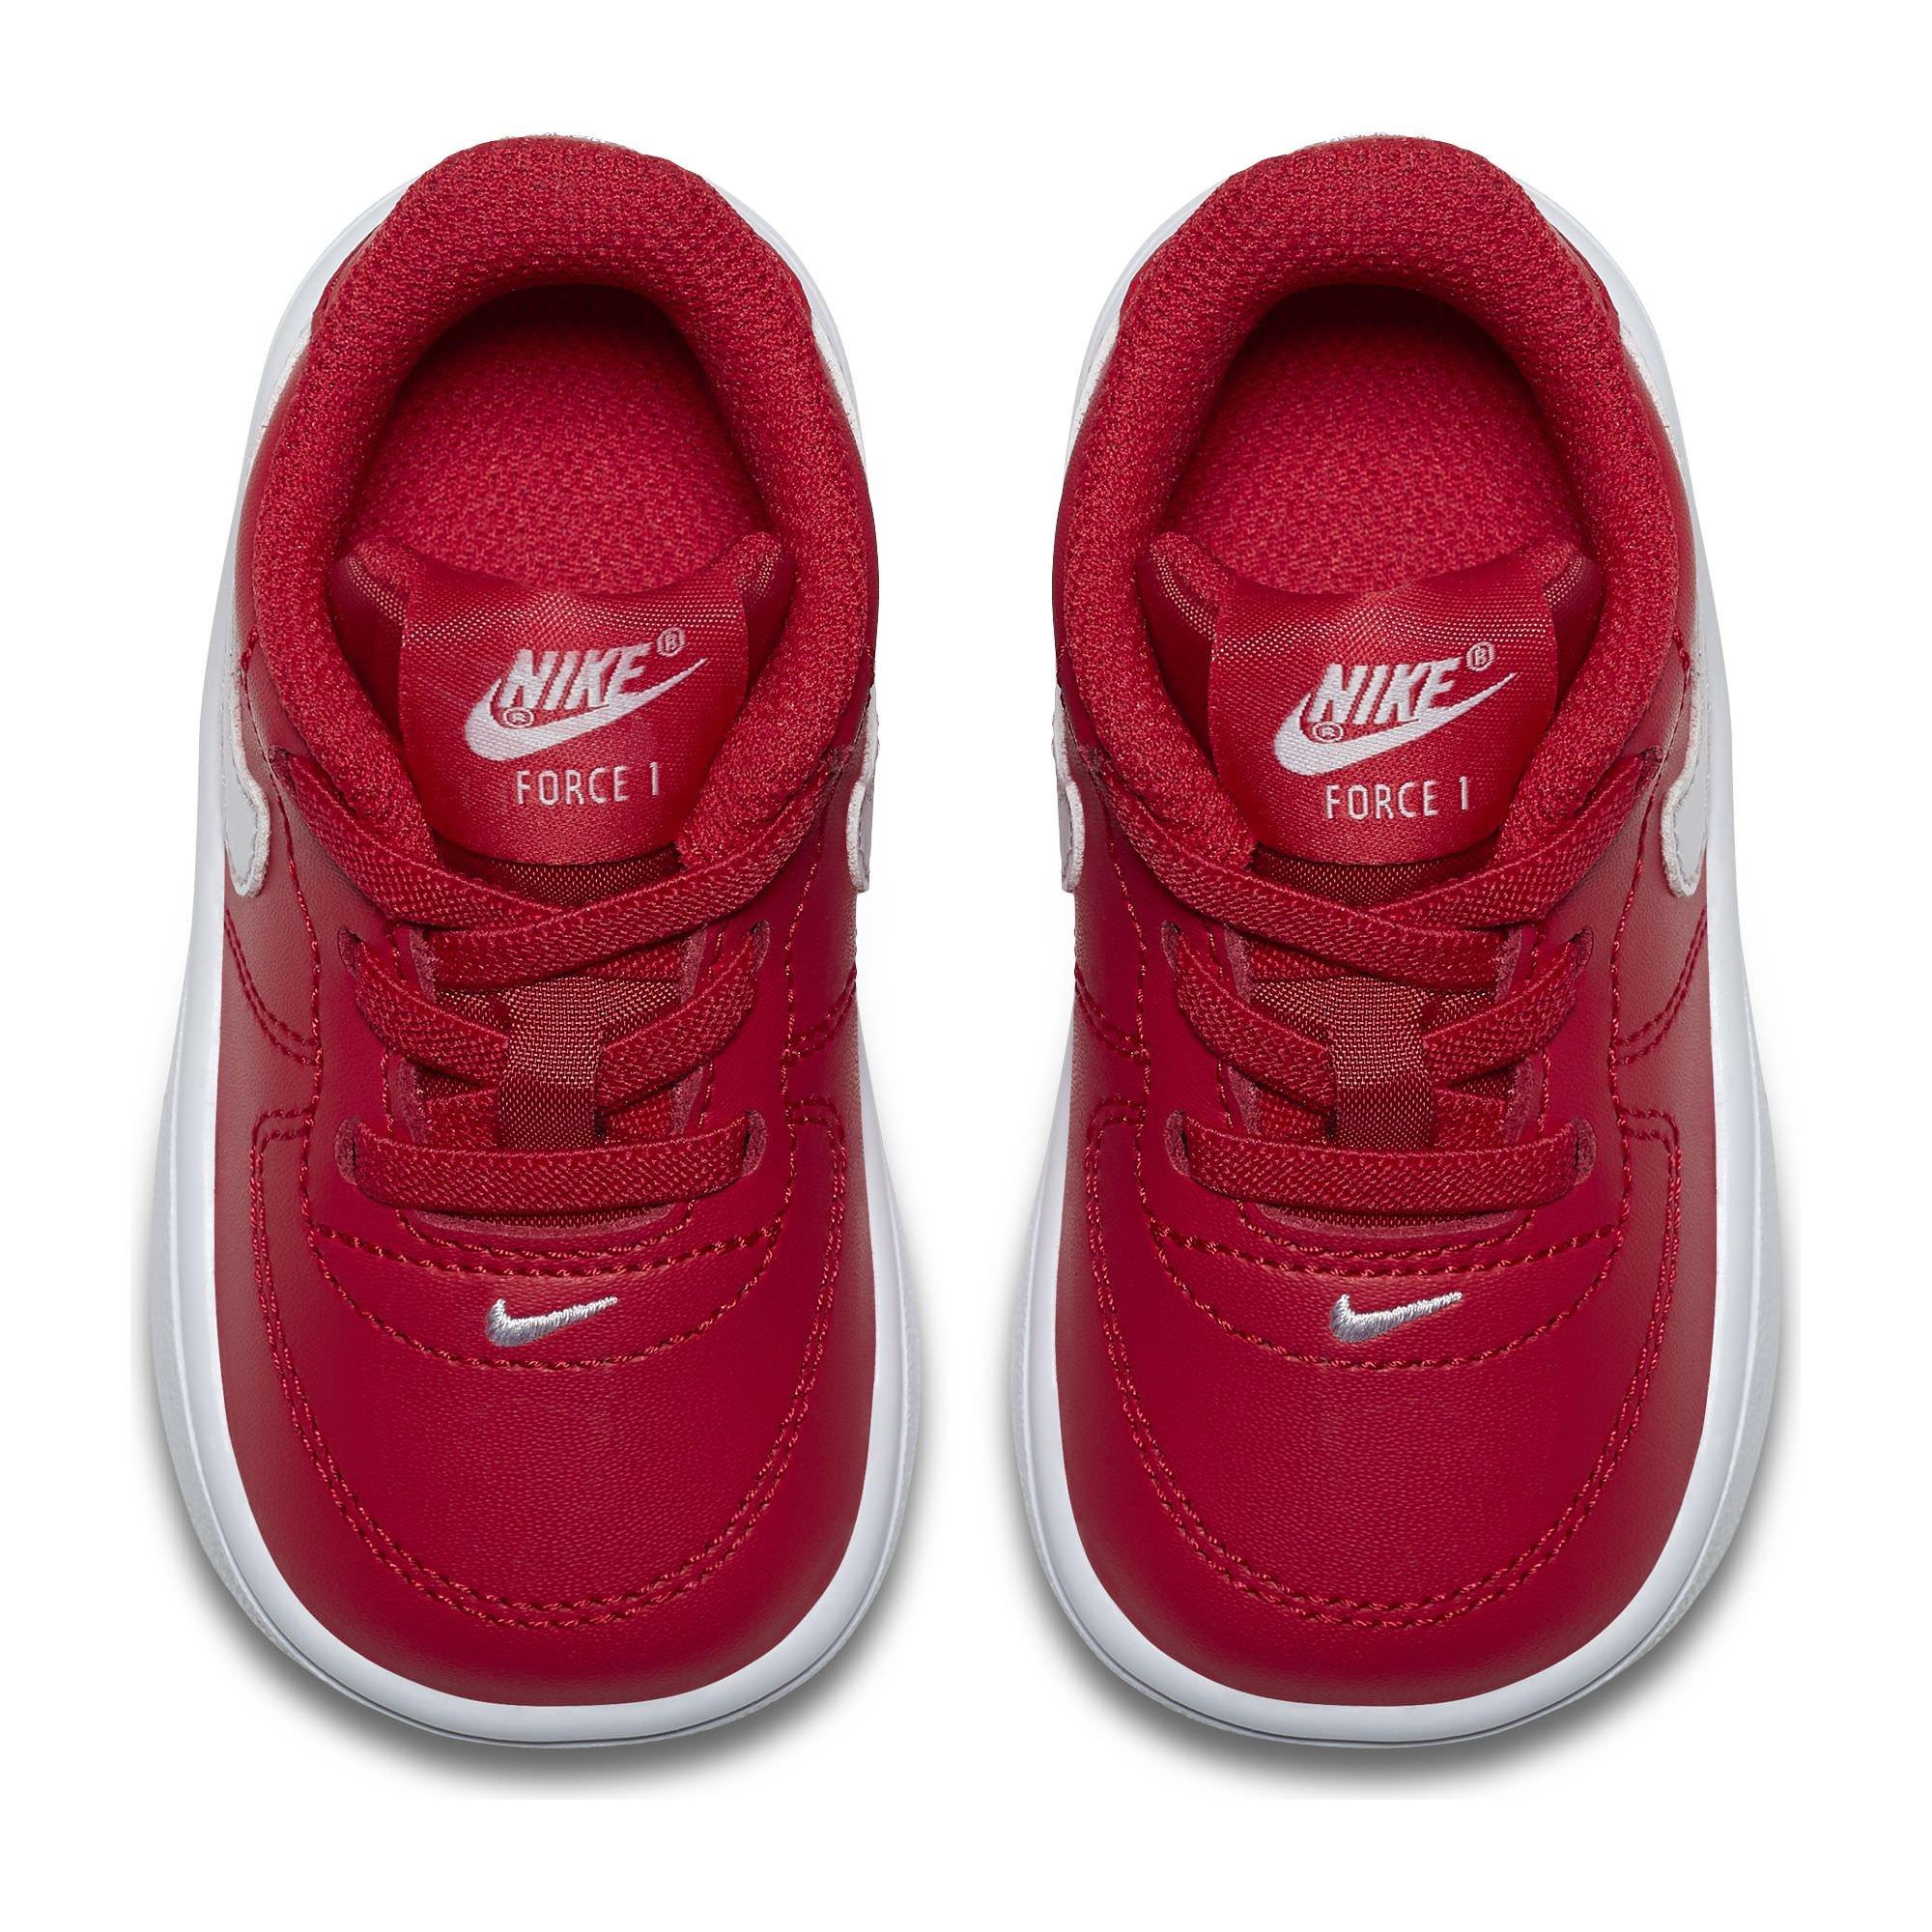 "f4e82cb5dbfa4 ▷ Ofertas Nike Air Force 1  18 Toddler TD ""University Red"" Retro ..."